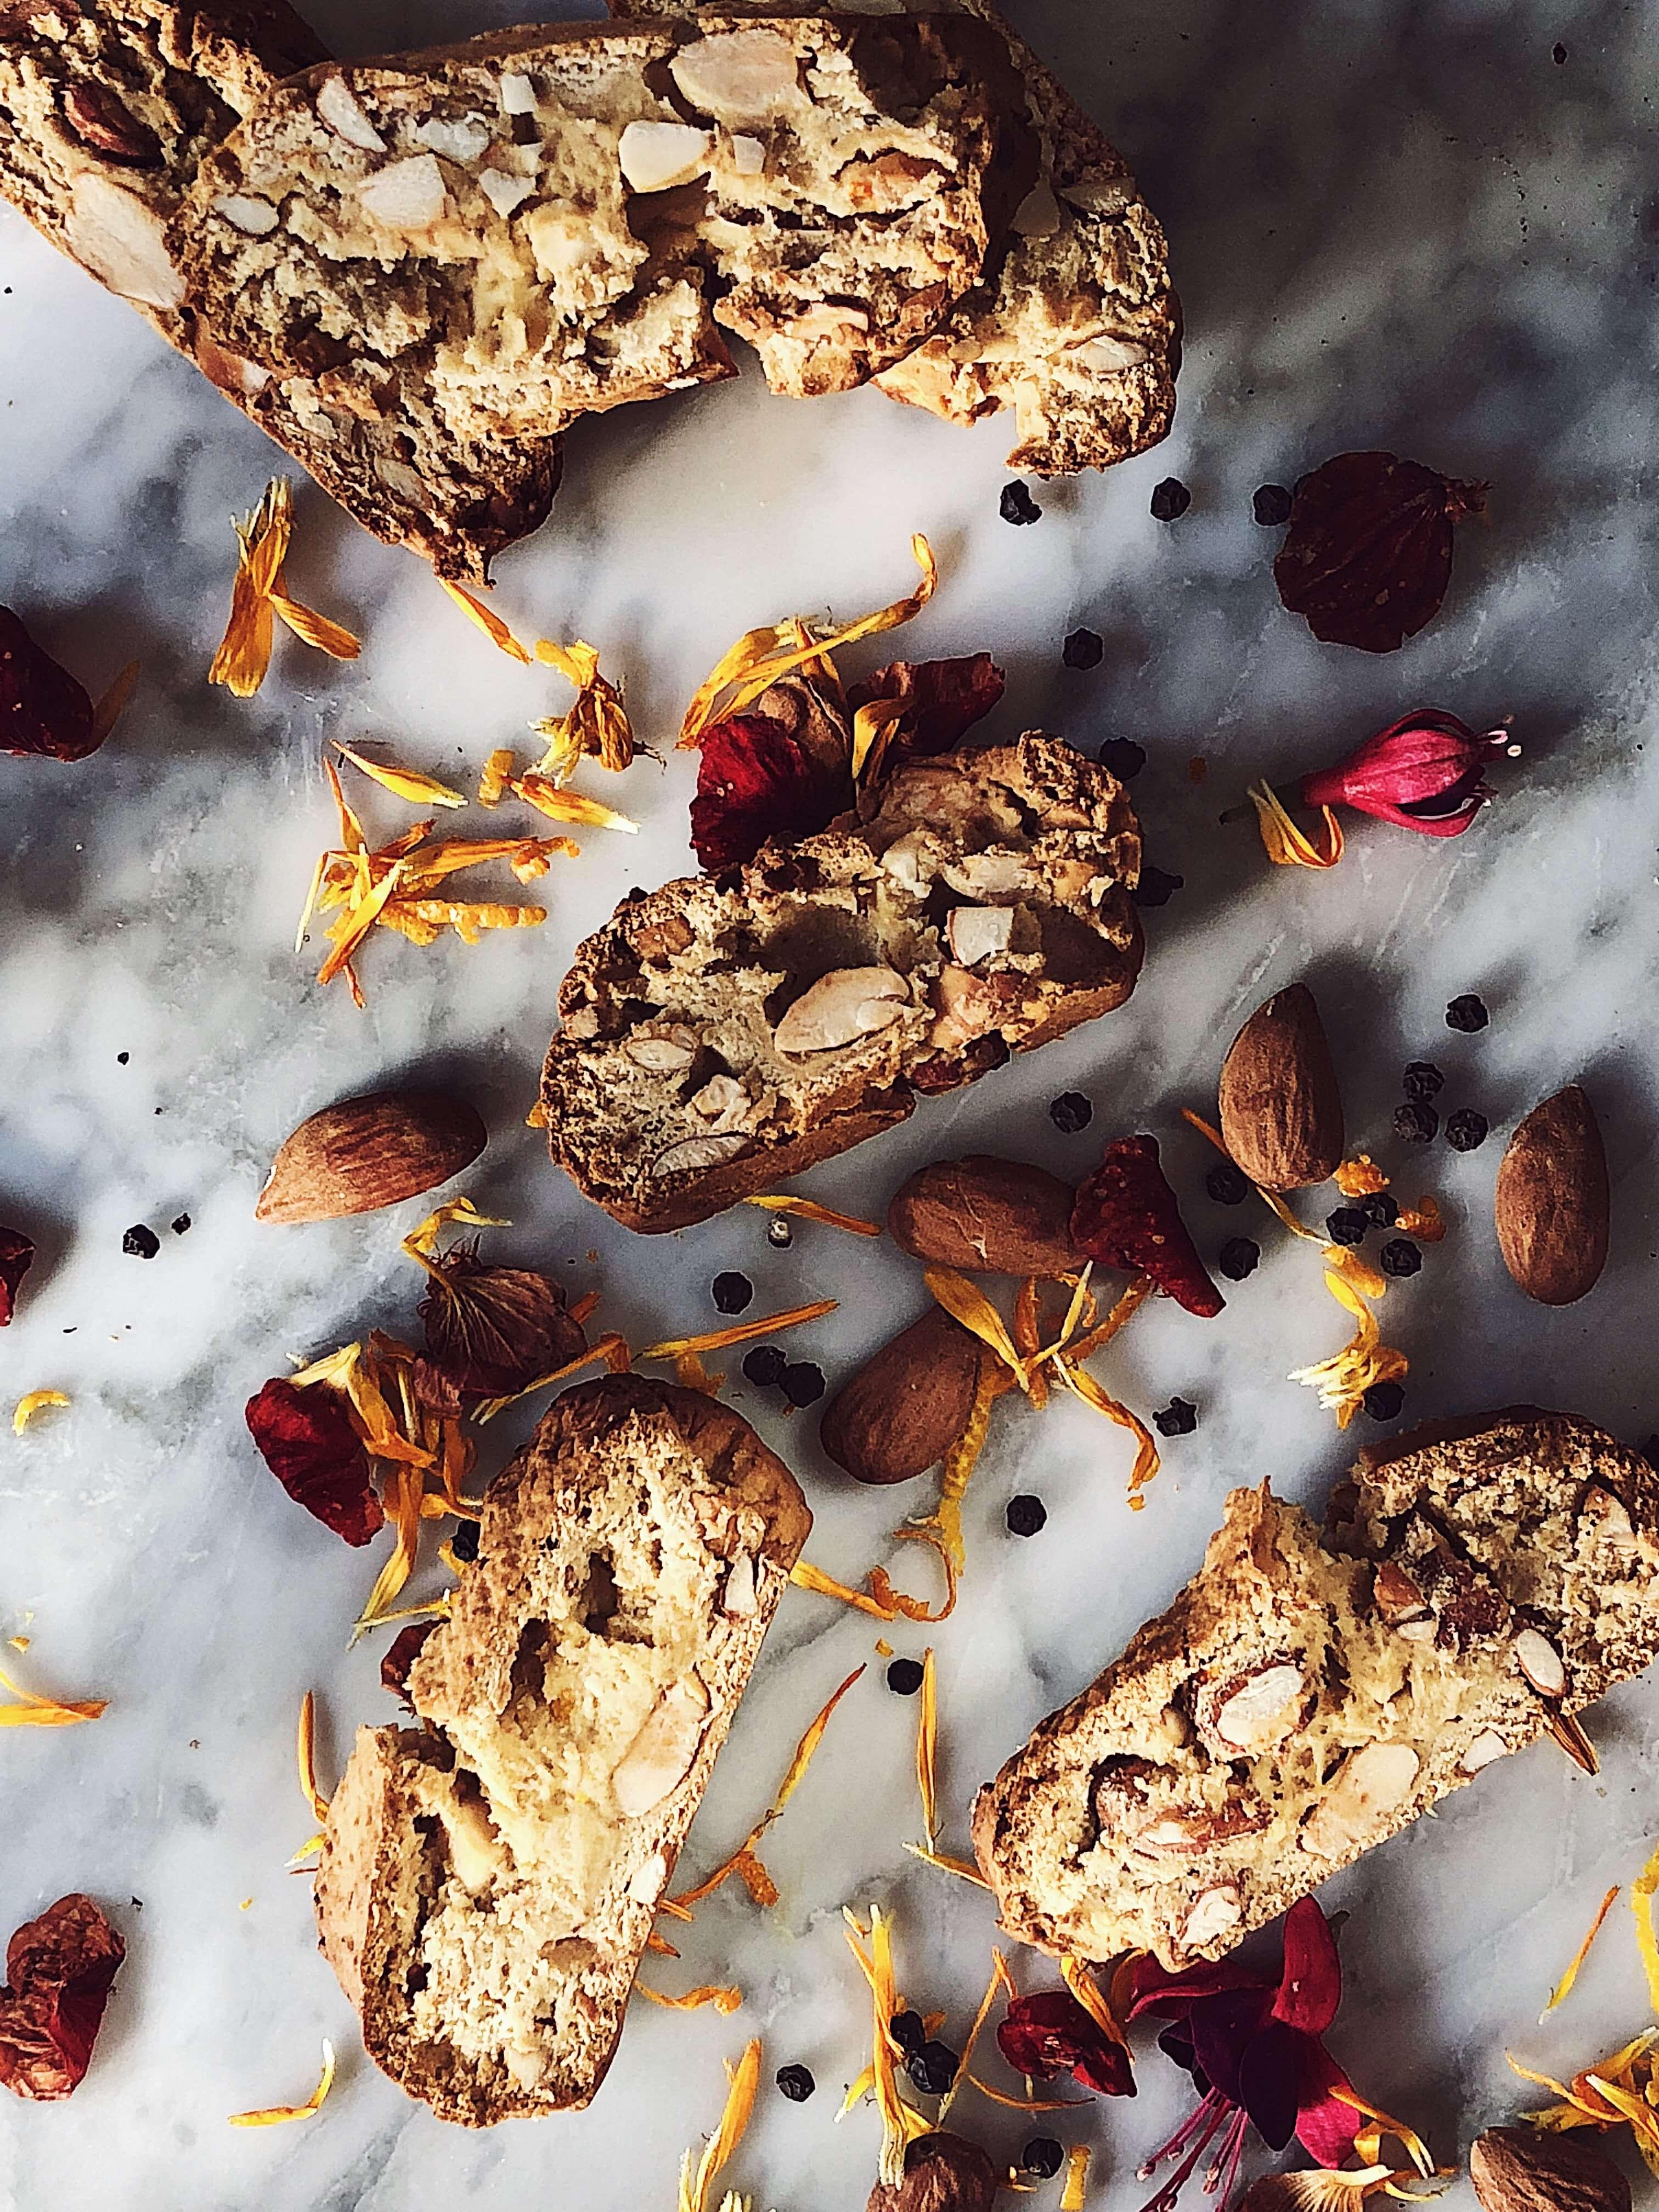 Italian cuisine magazine: Italian pepatelli biscotti regional recipes #thegourmetmag #italy